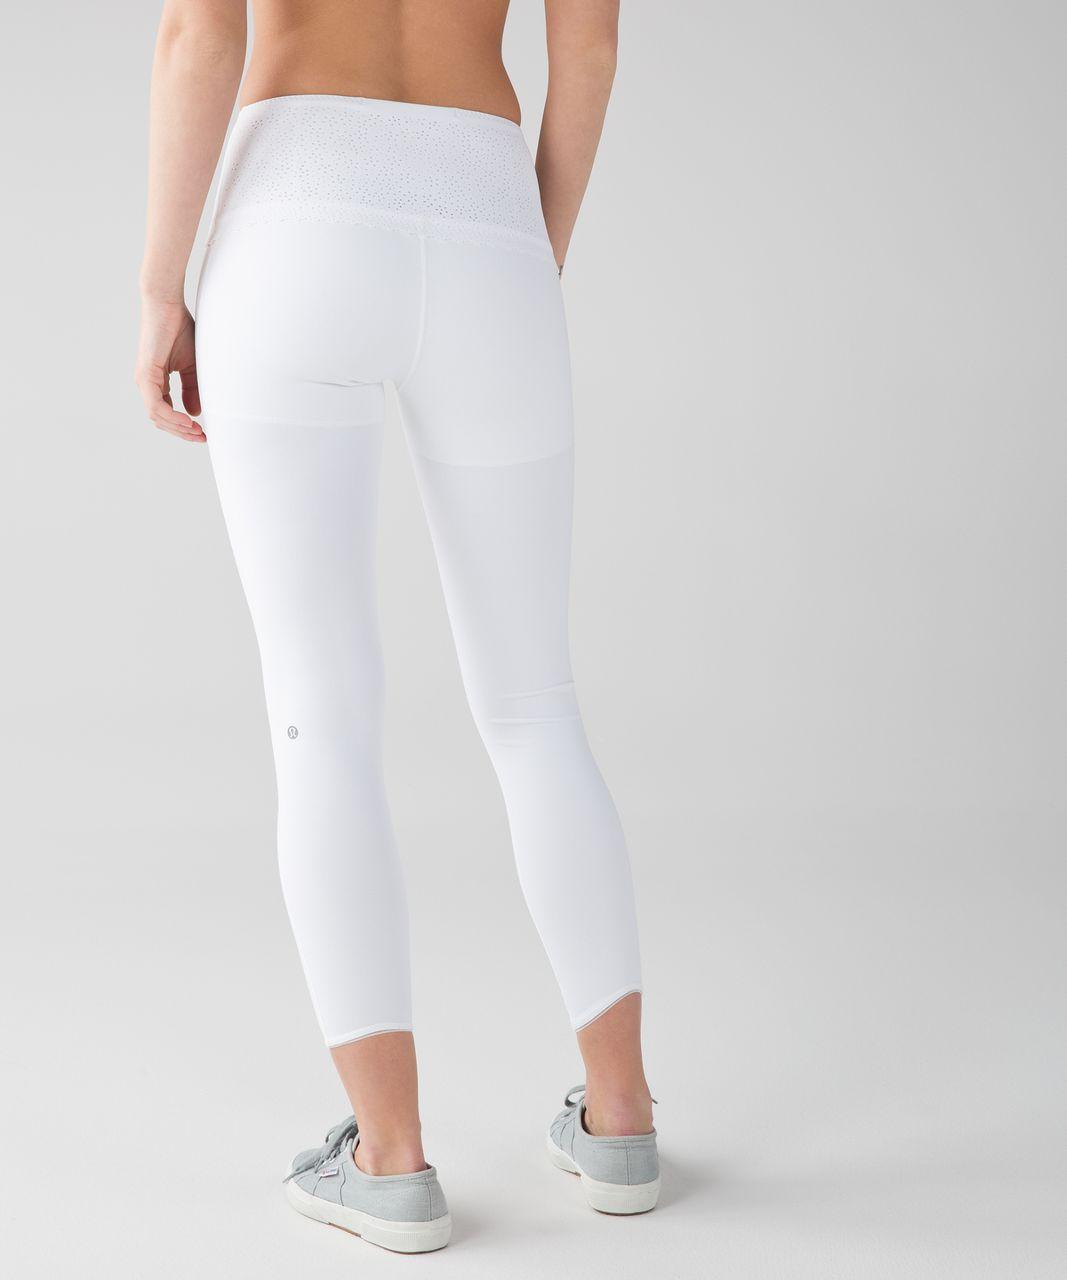 Lululemon Free Spirit Pant - White